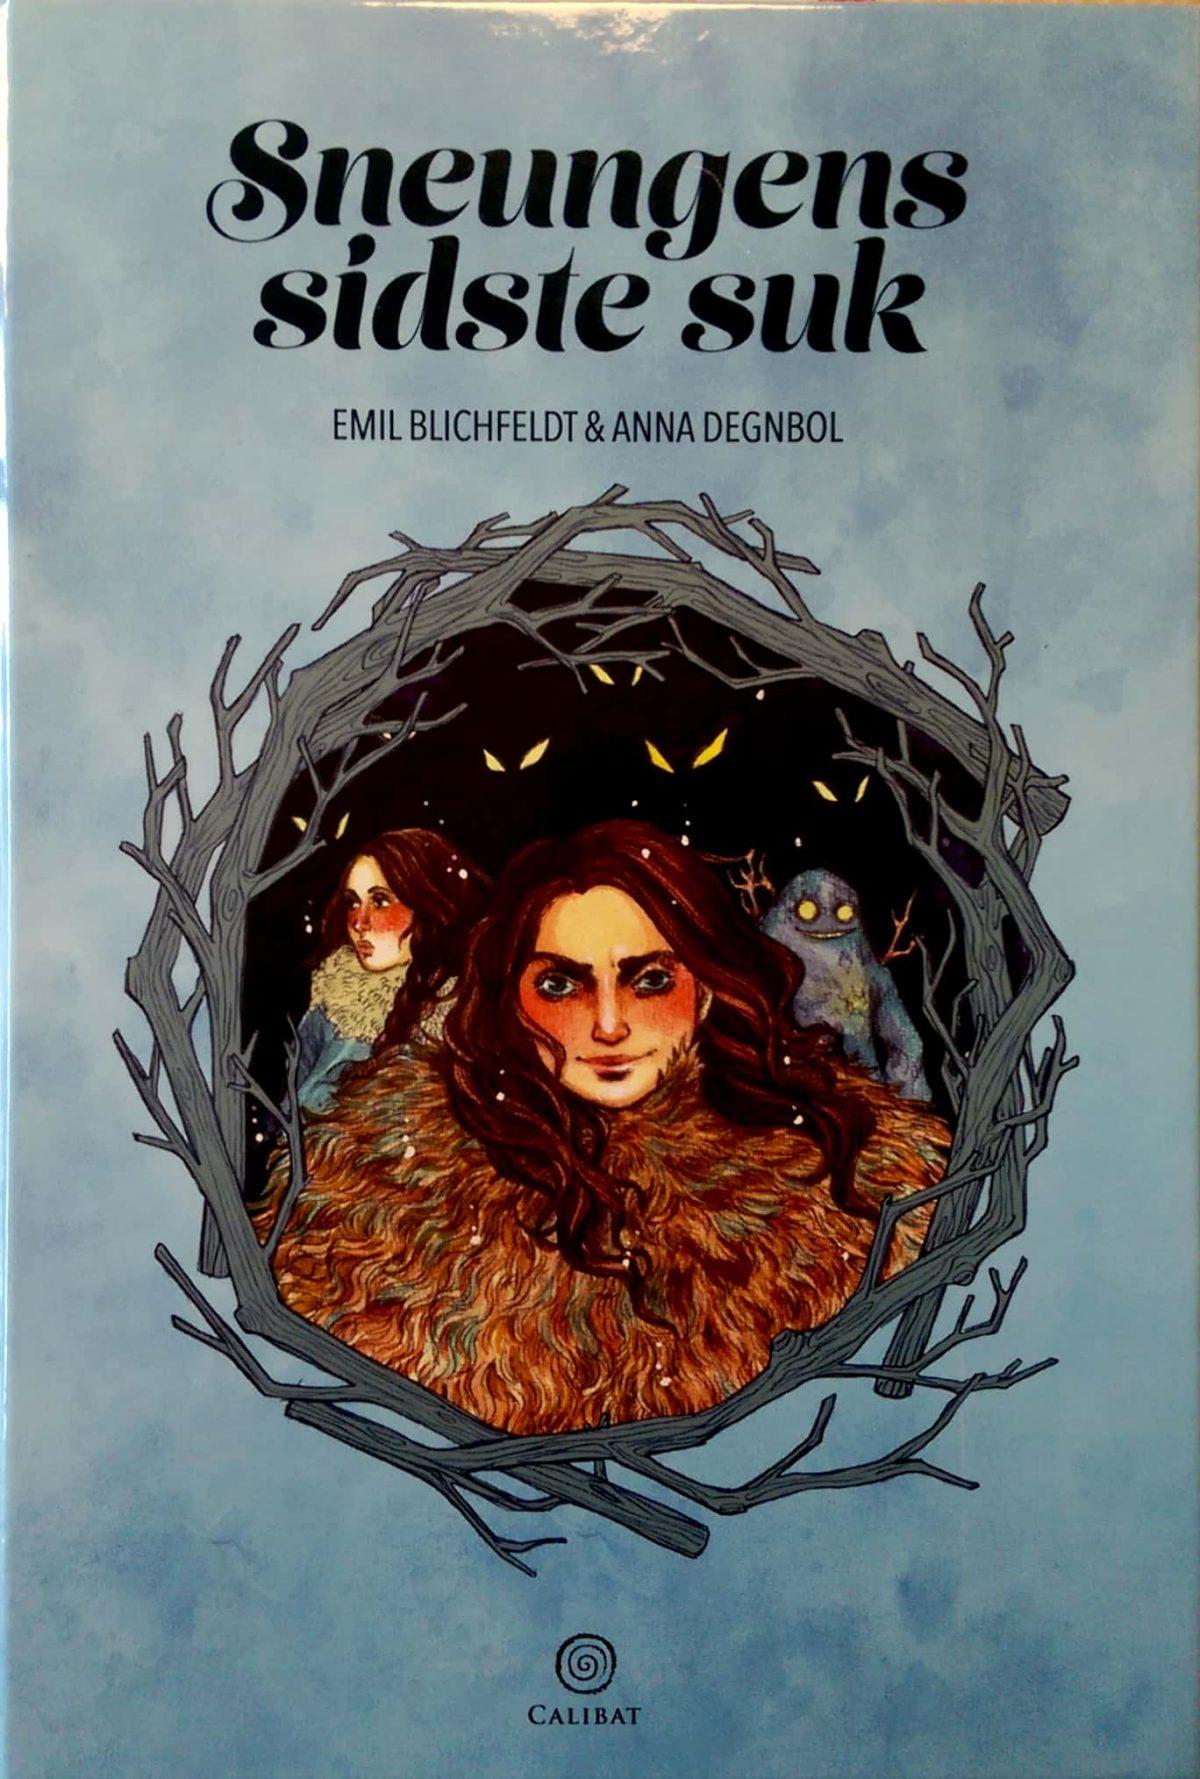 Sneungens-Sidste-Suk